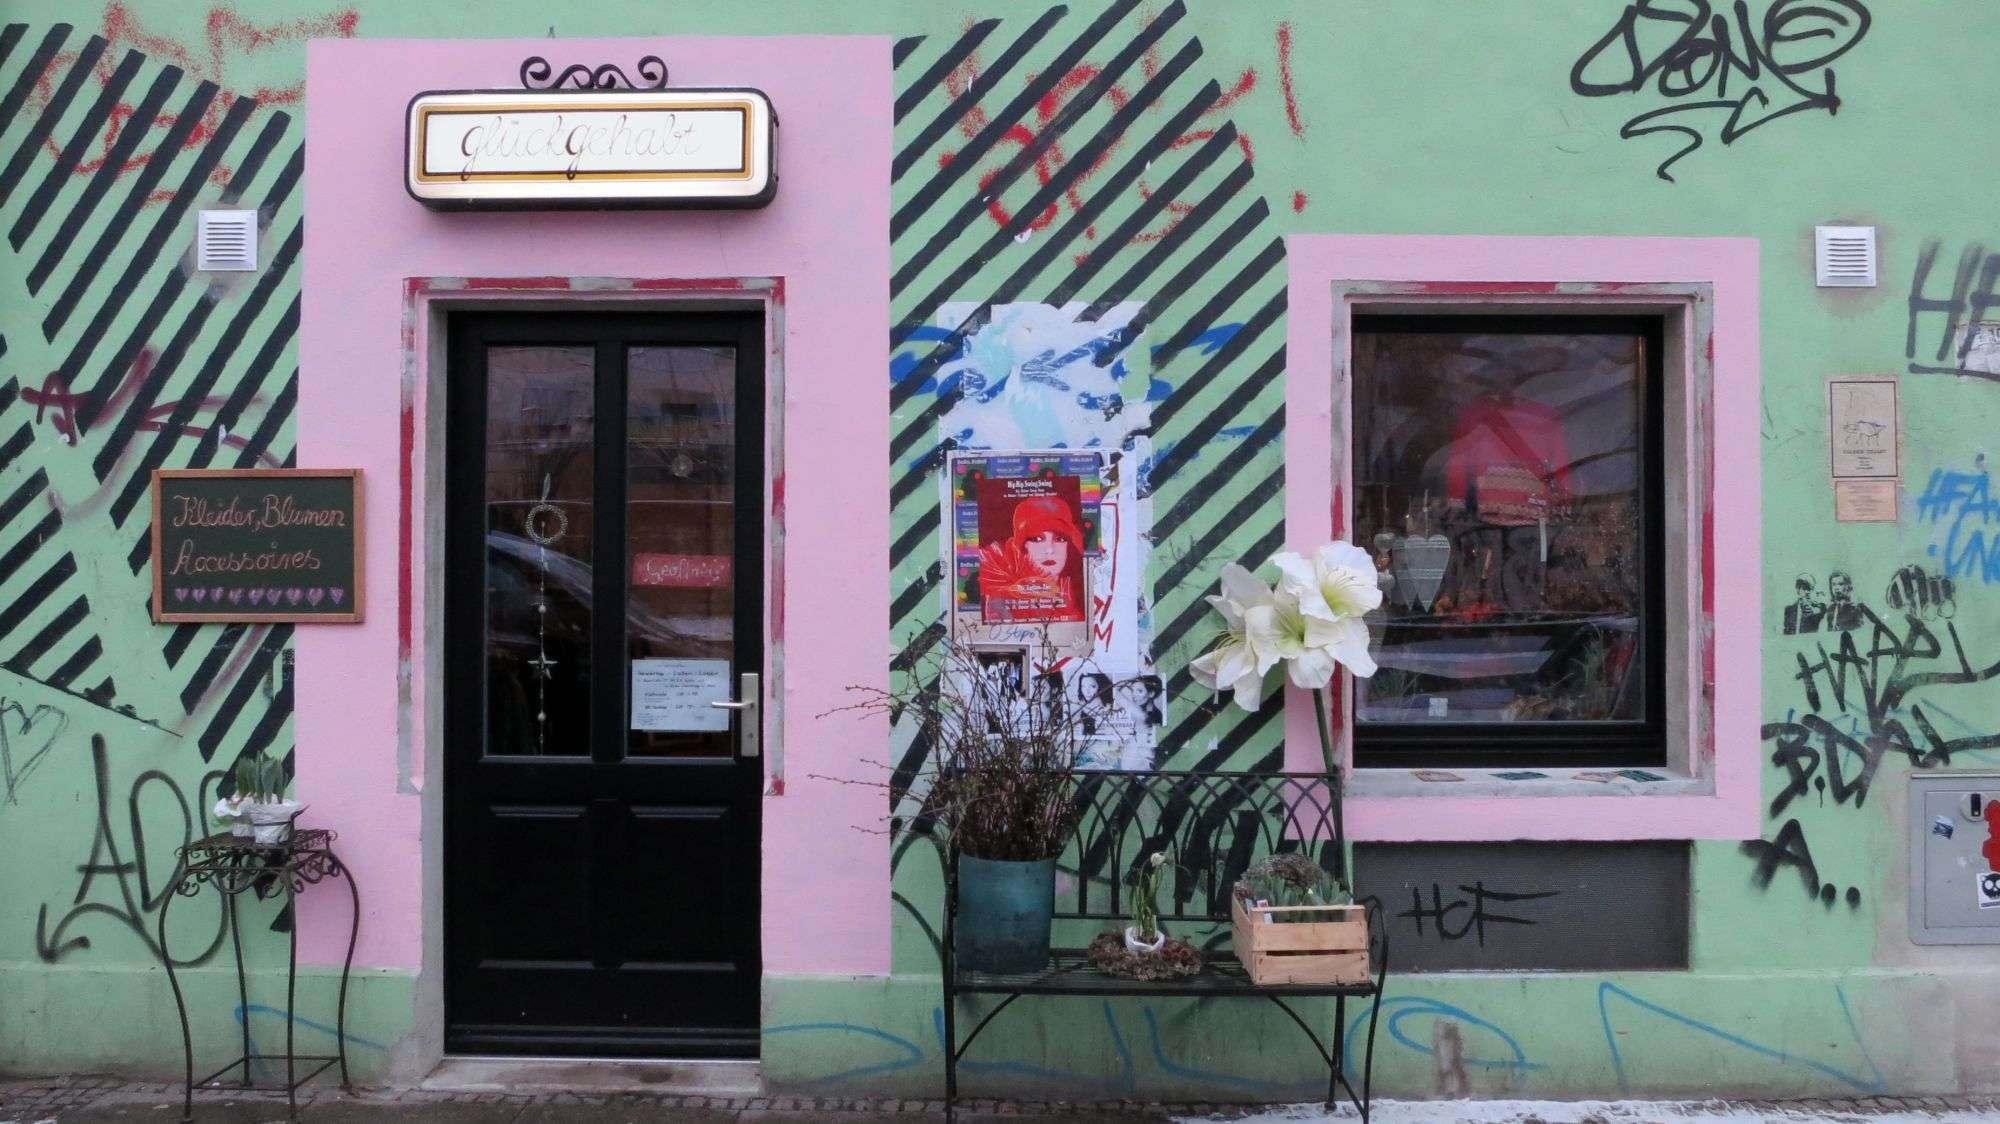 """Glück gehabt"", Alaunstraße 29"